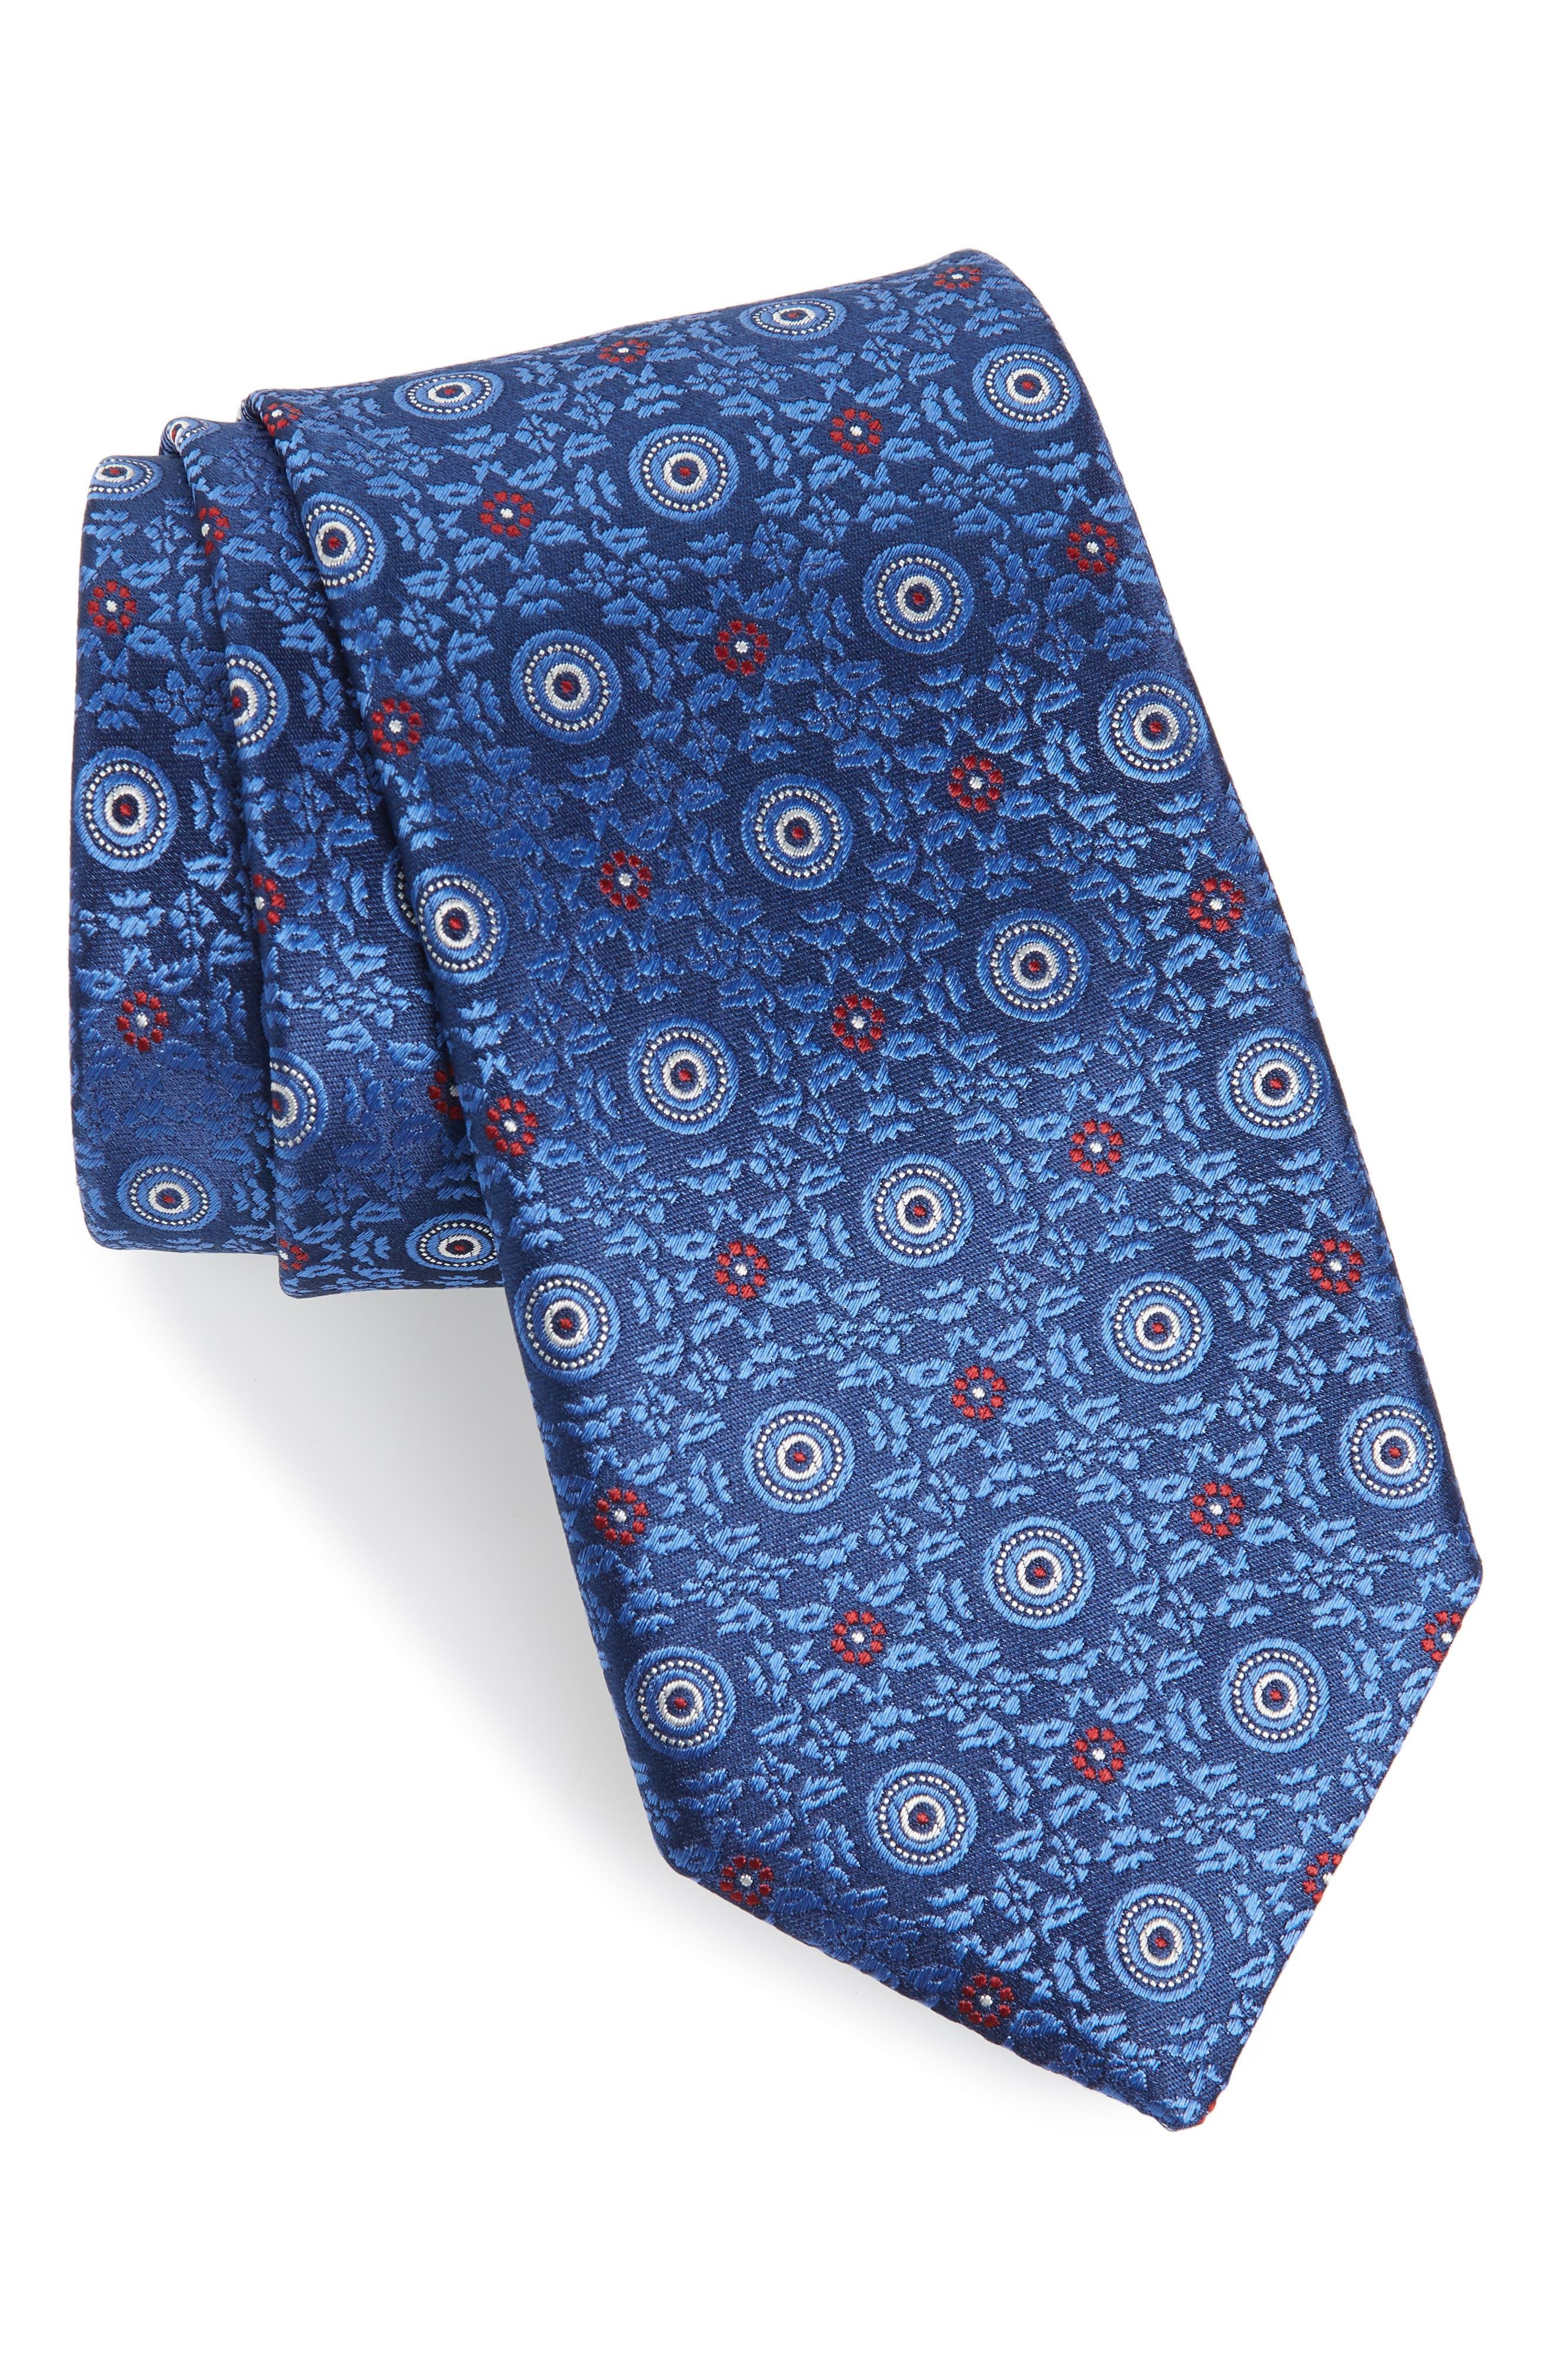 CANALI, Medallion Silk X-Long Tie, Main thumbnail 1, color, BLUE